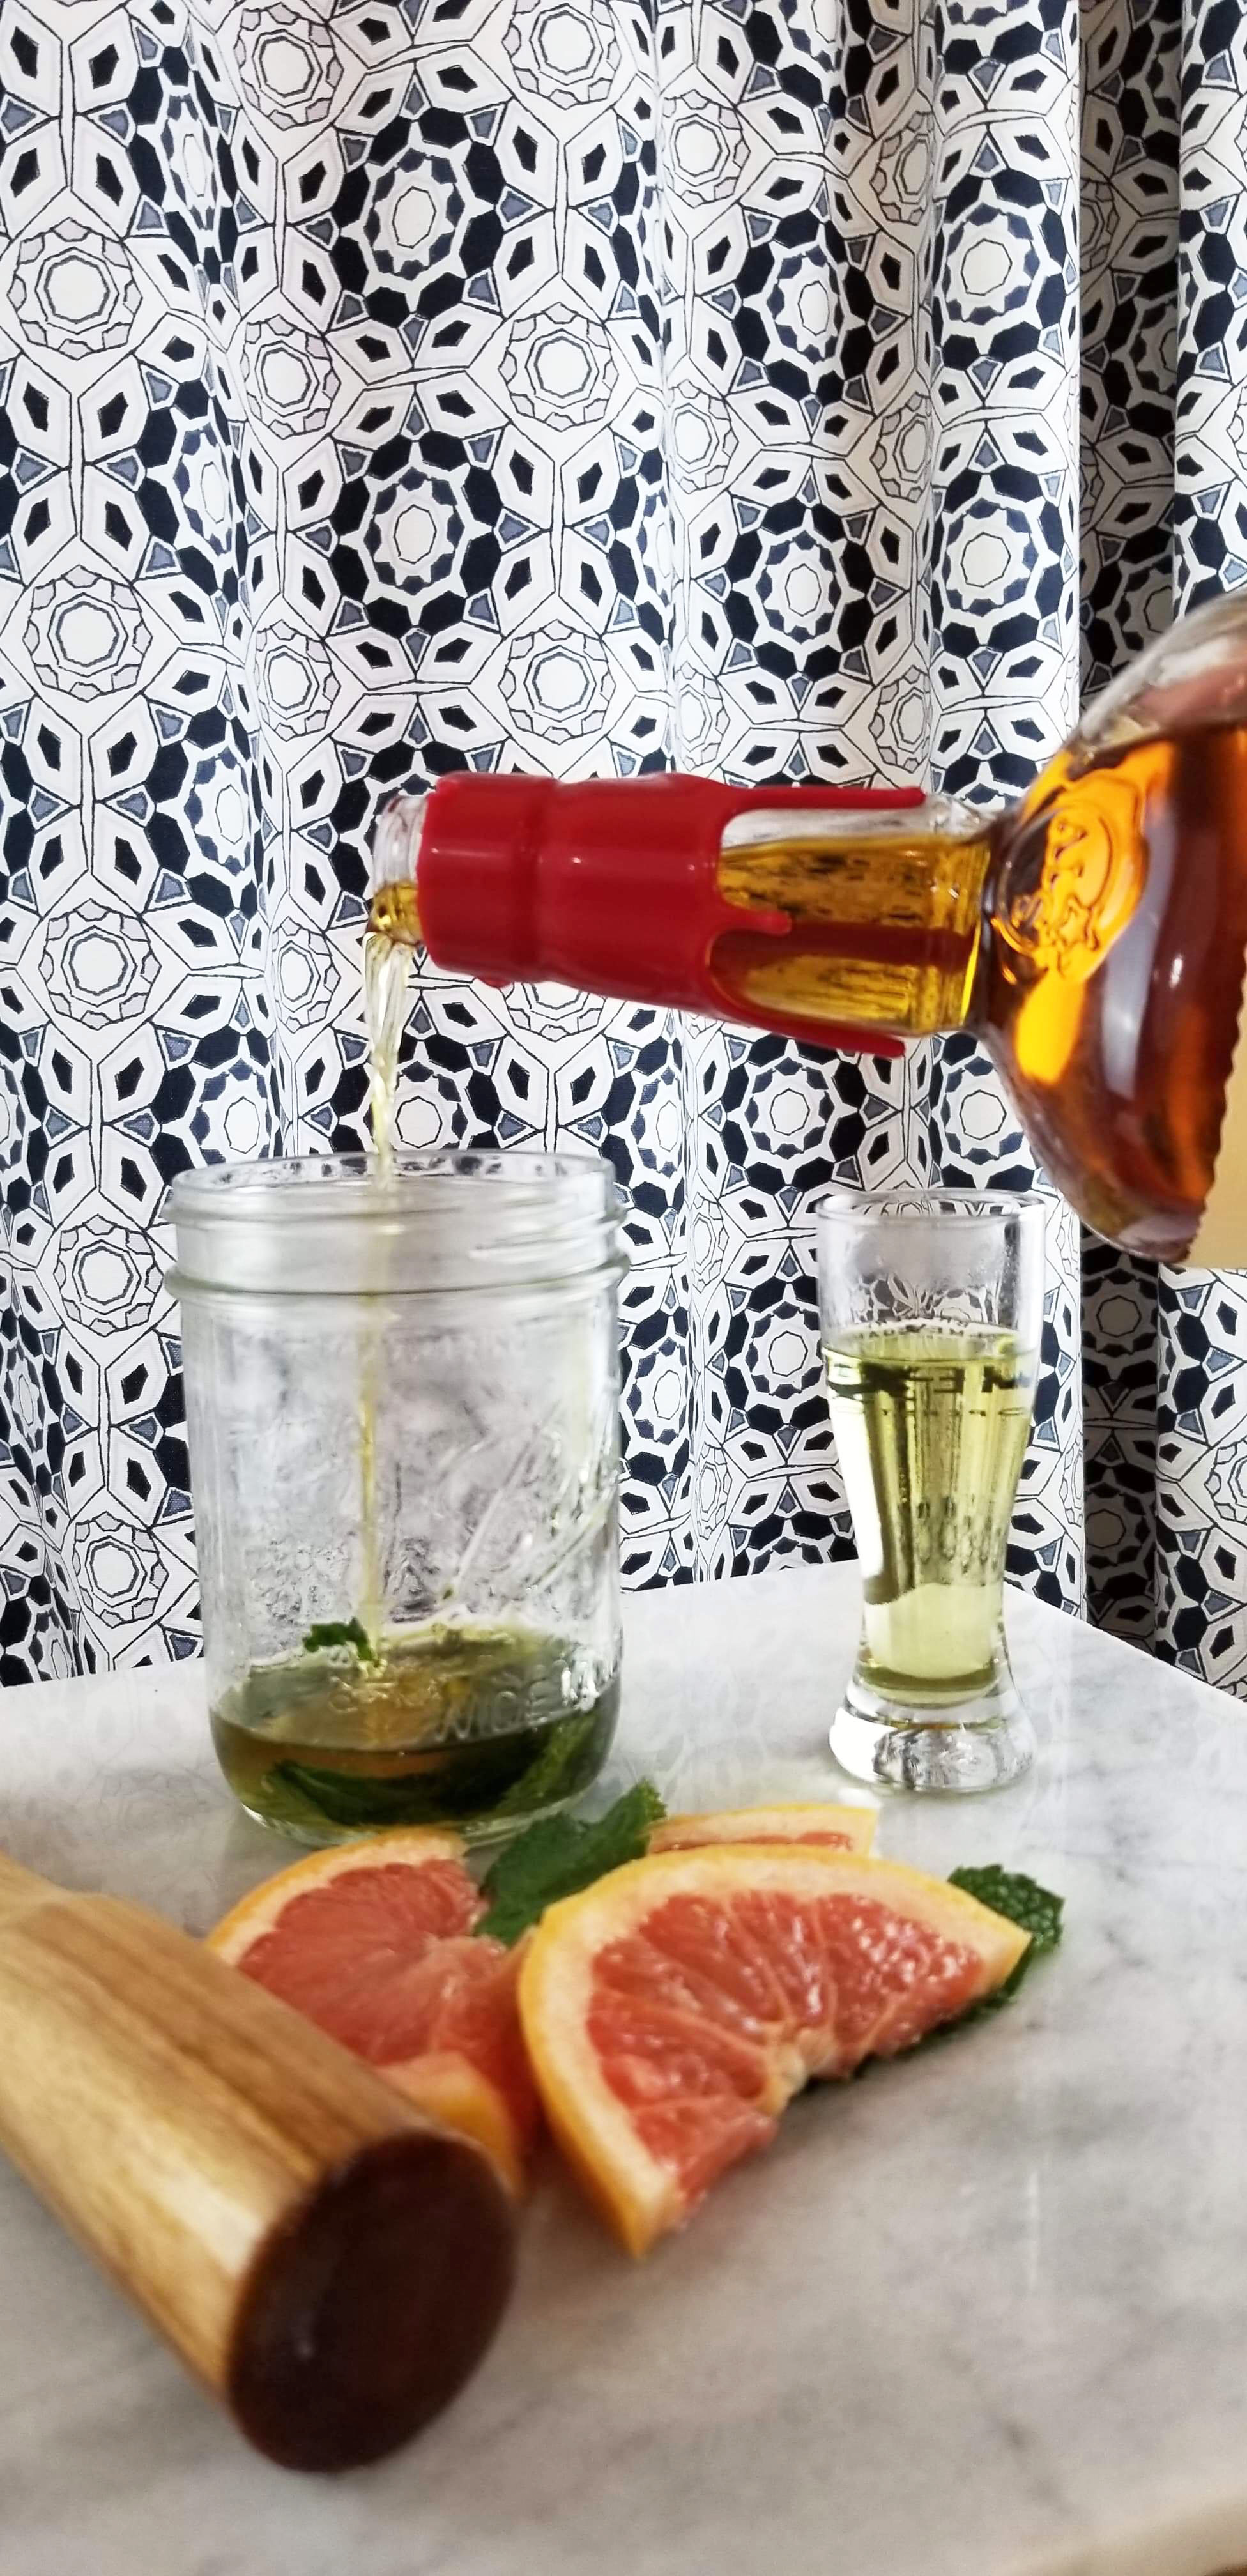 Gotta love a good pour shot!